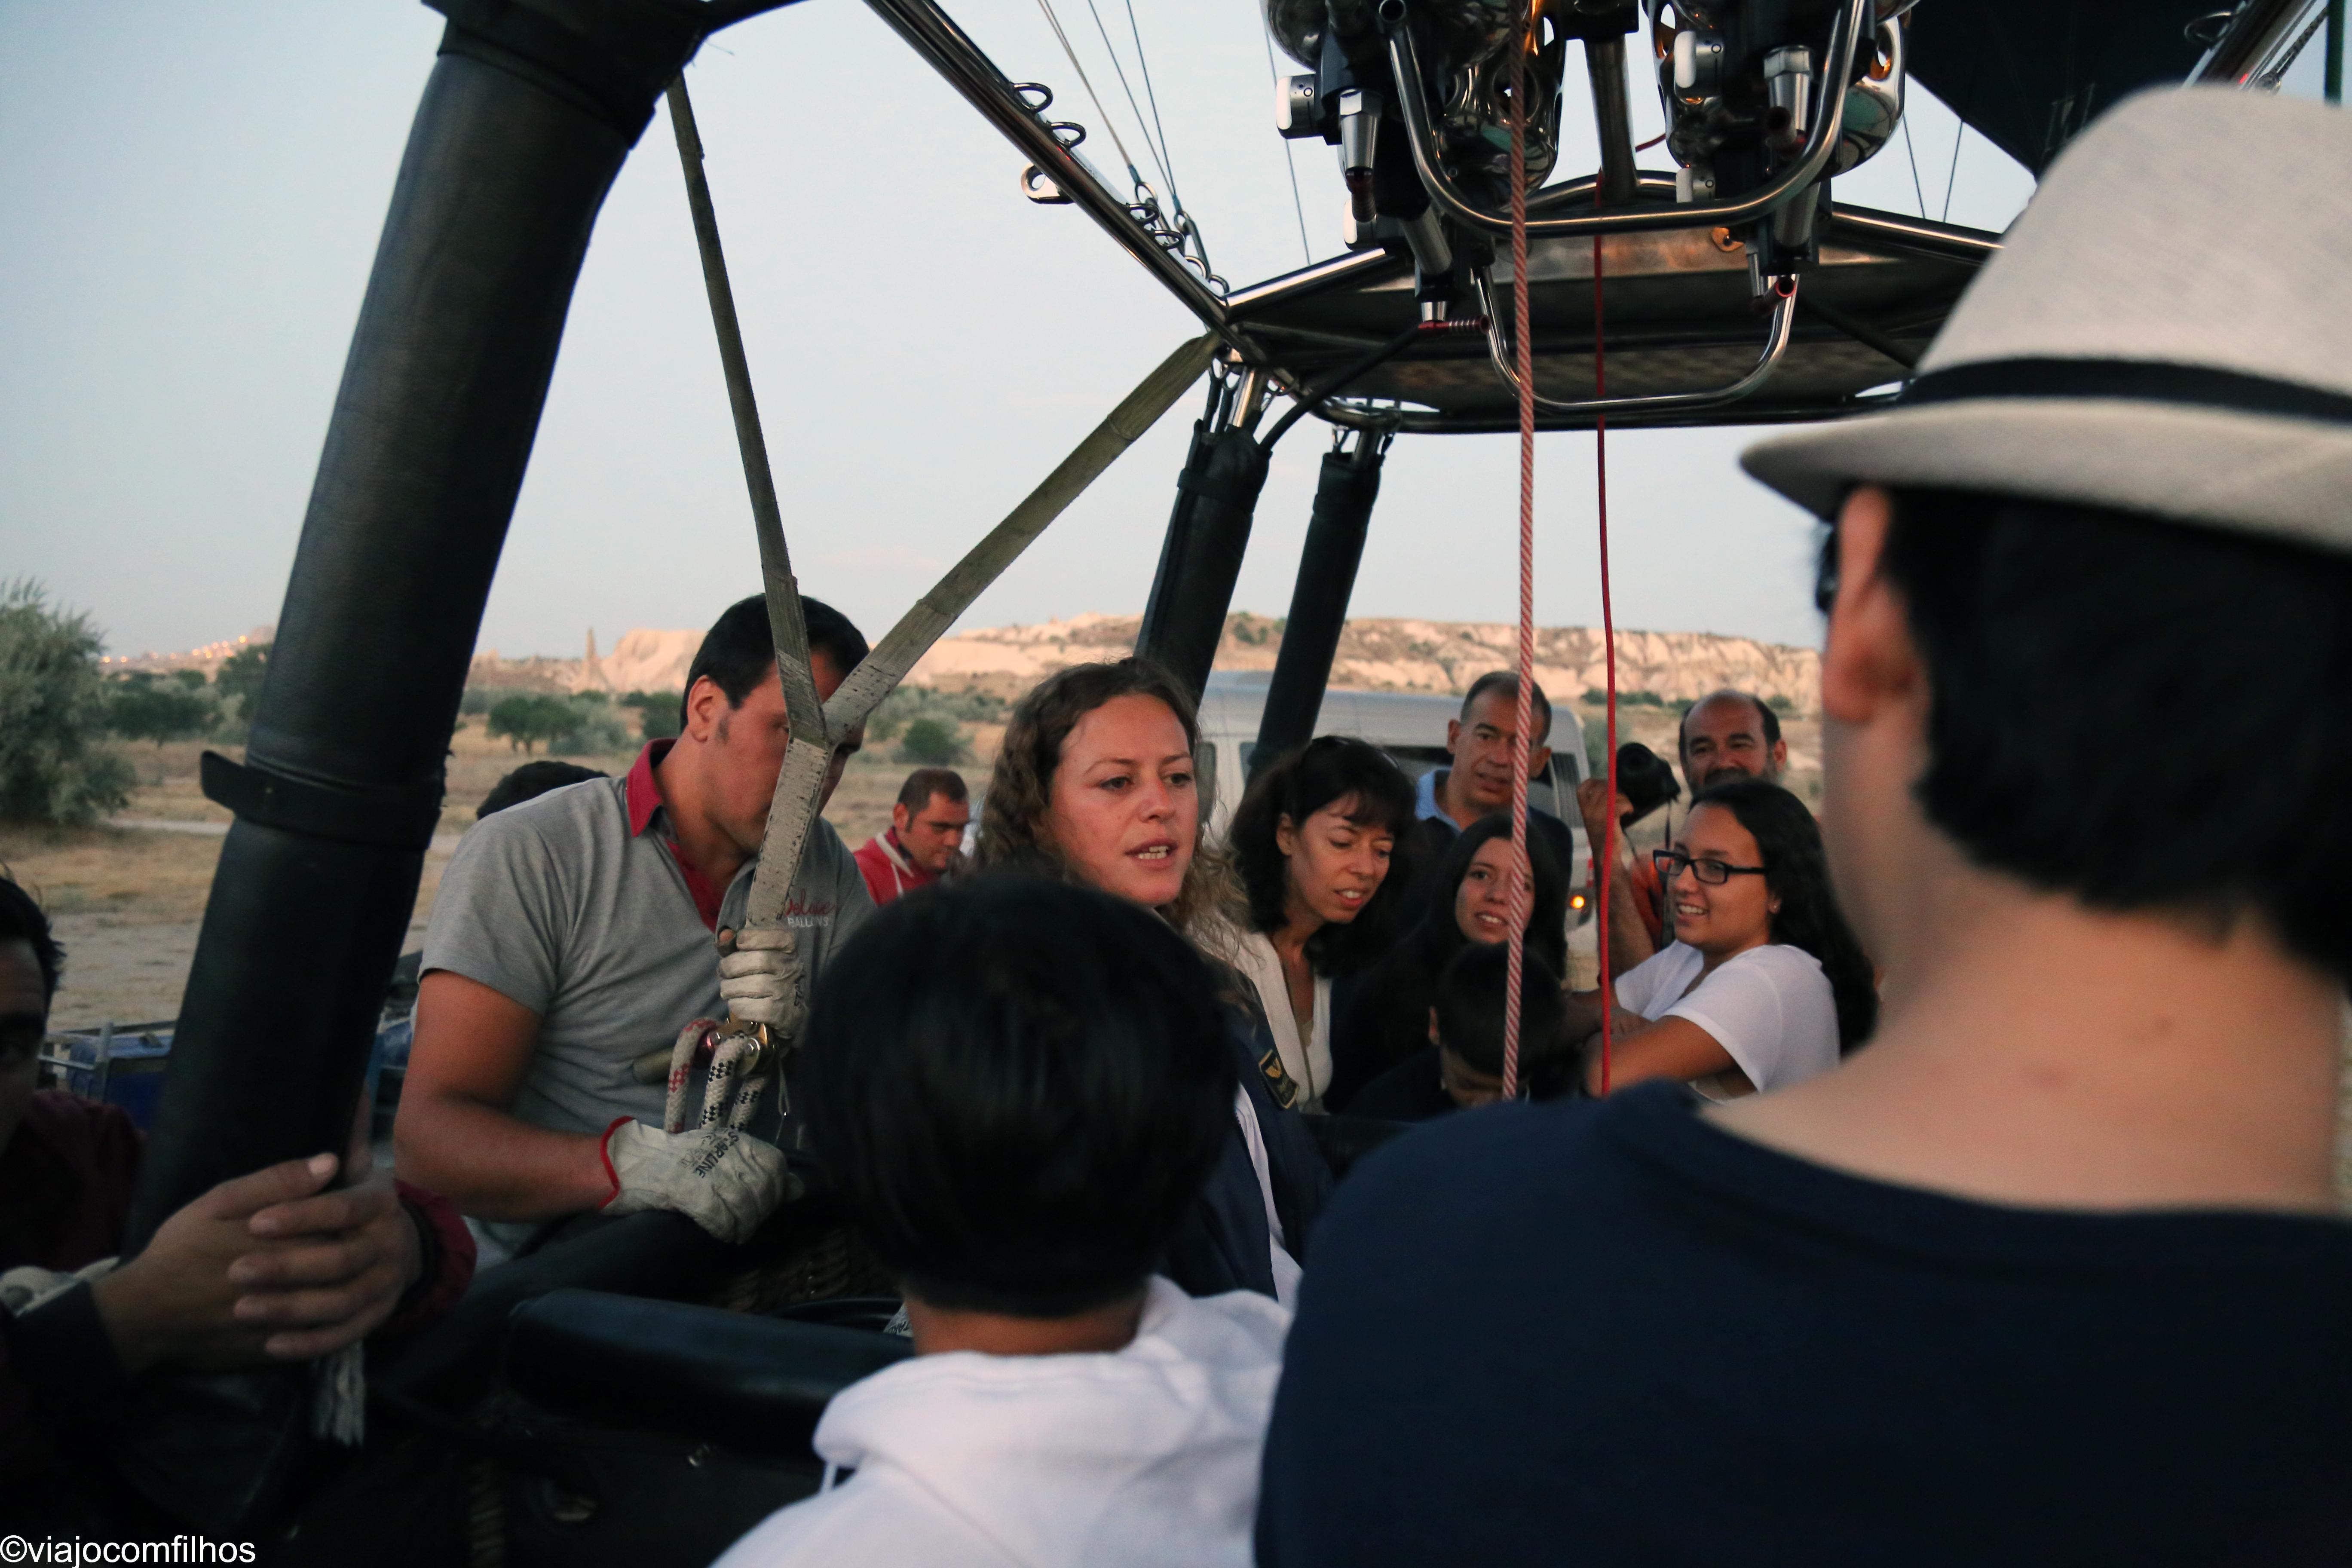 Piloto dando instruçoes